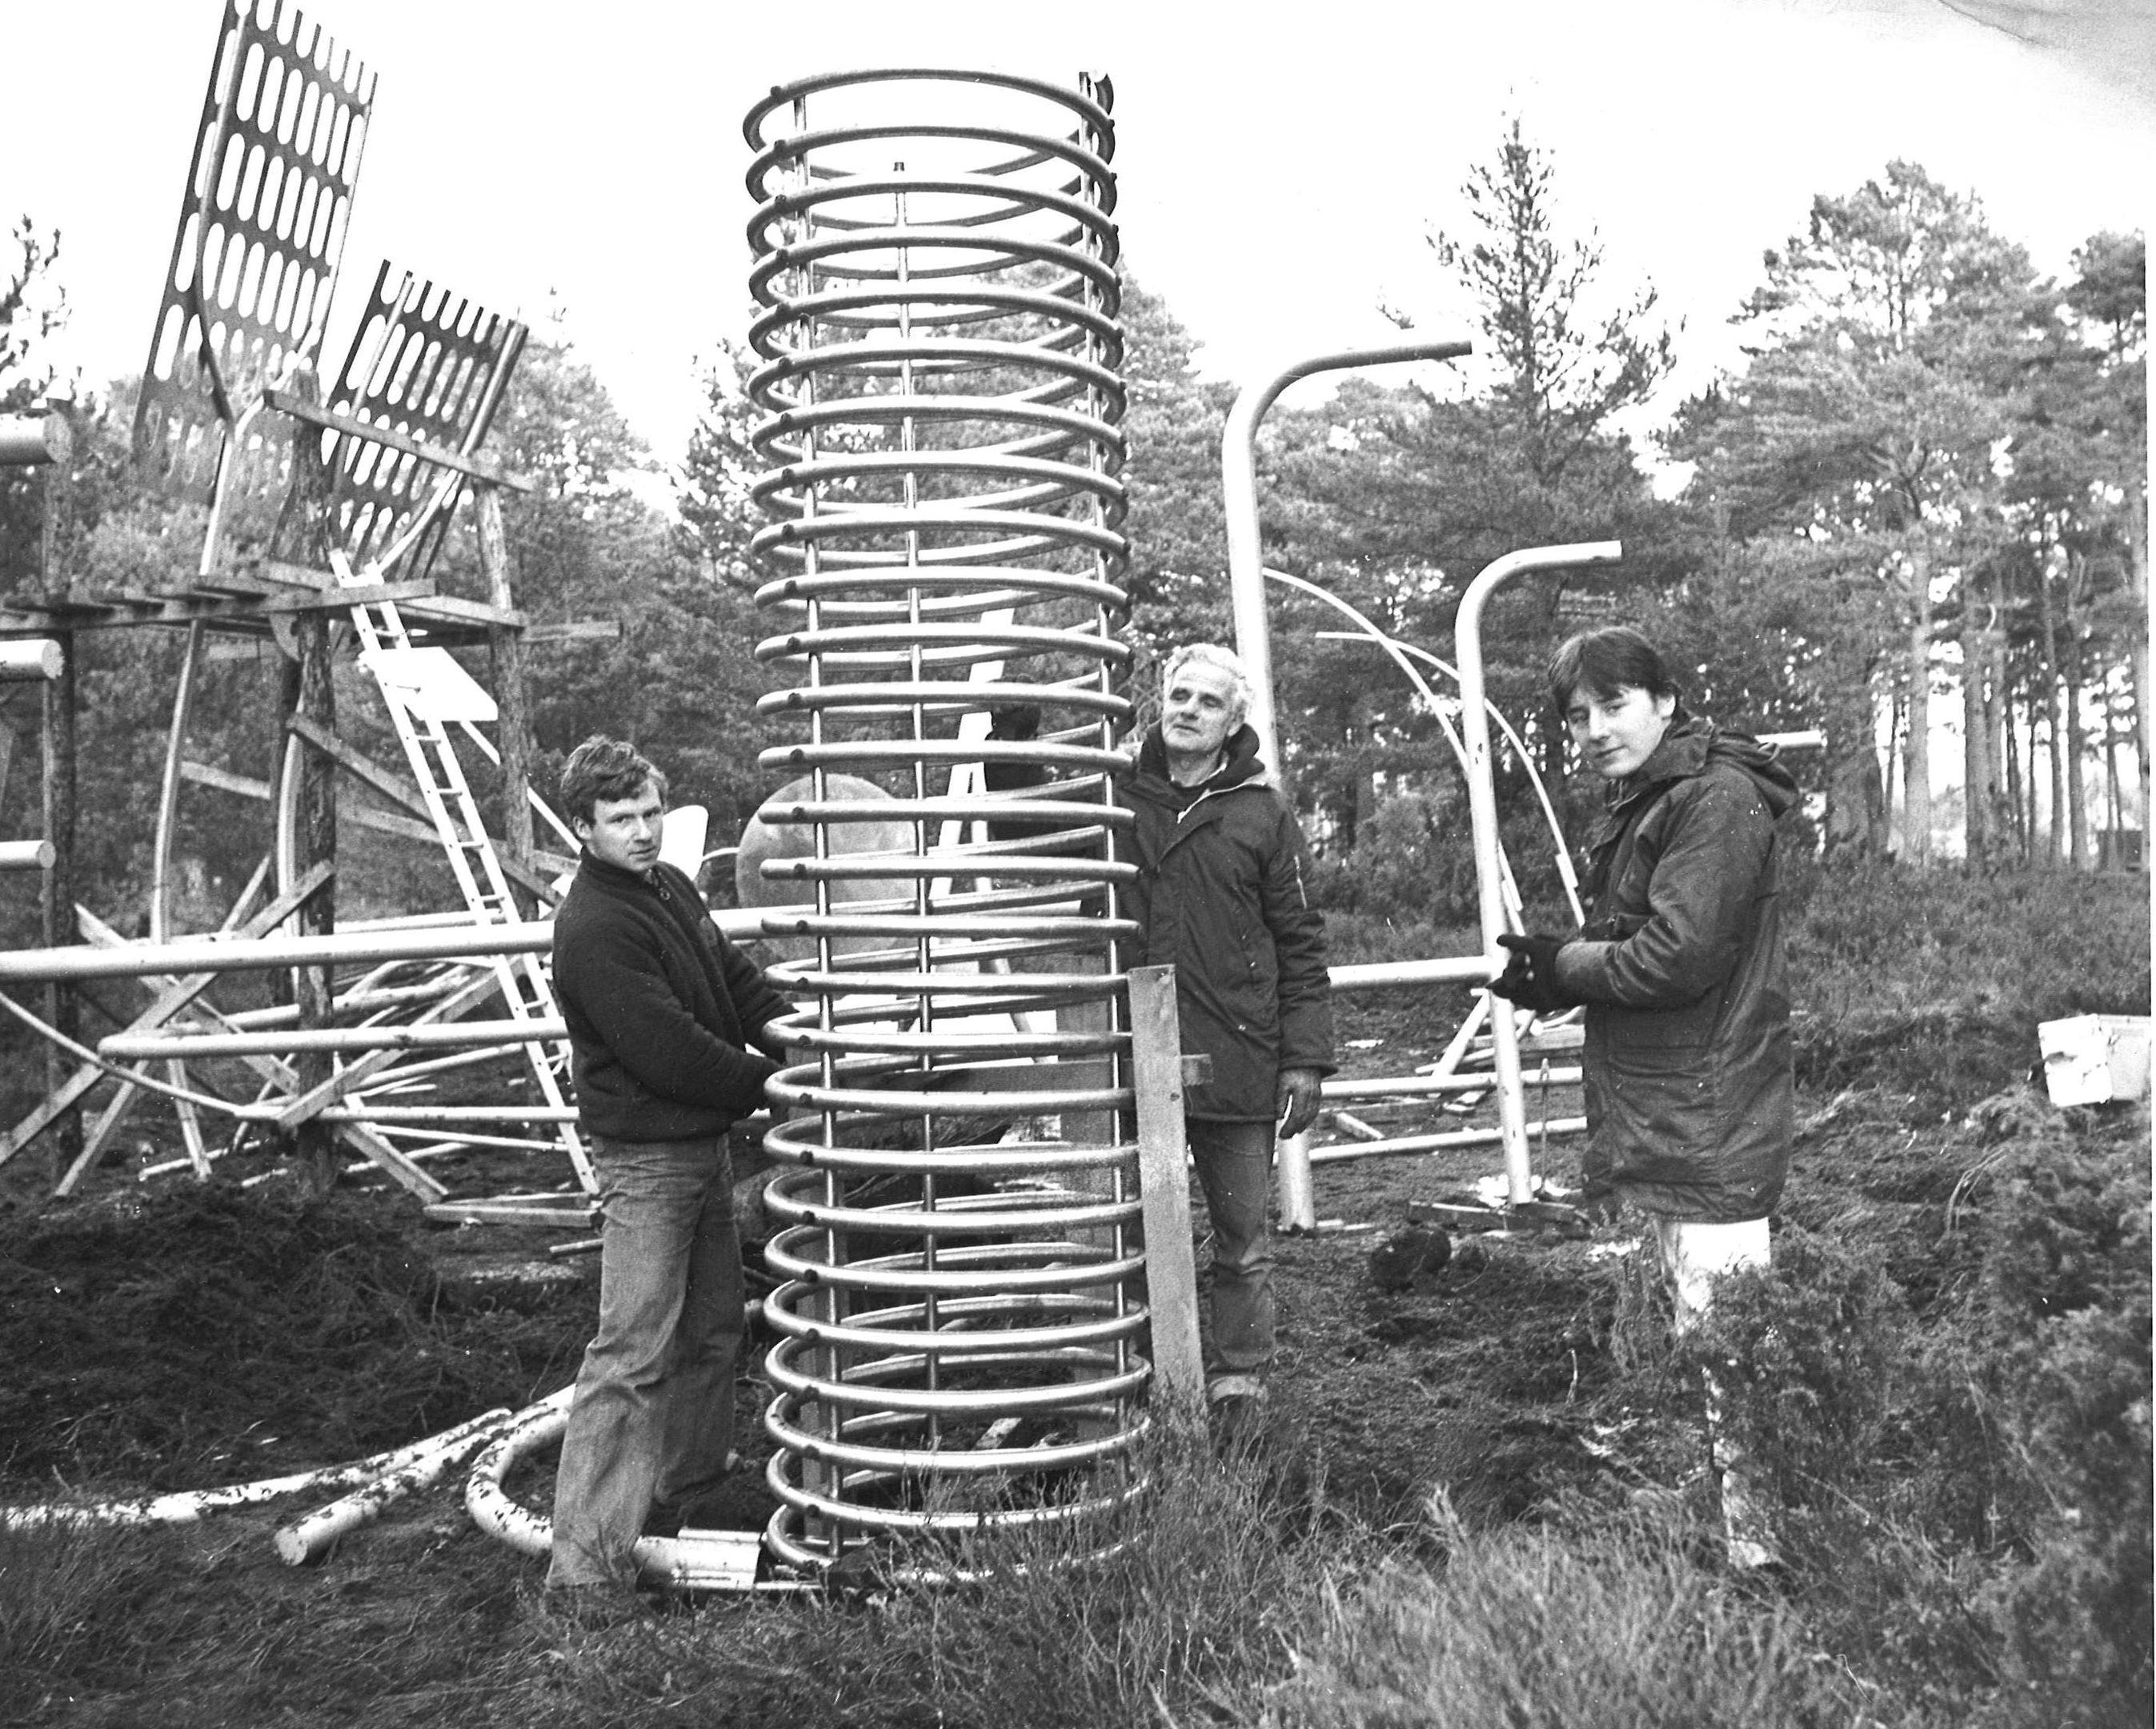 Lindsay McInnes, Ian McInnes and Landmark manager Danny Fullarton put together new sculpture at Landmark in 1982